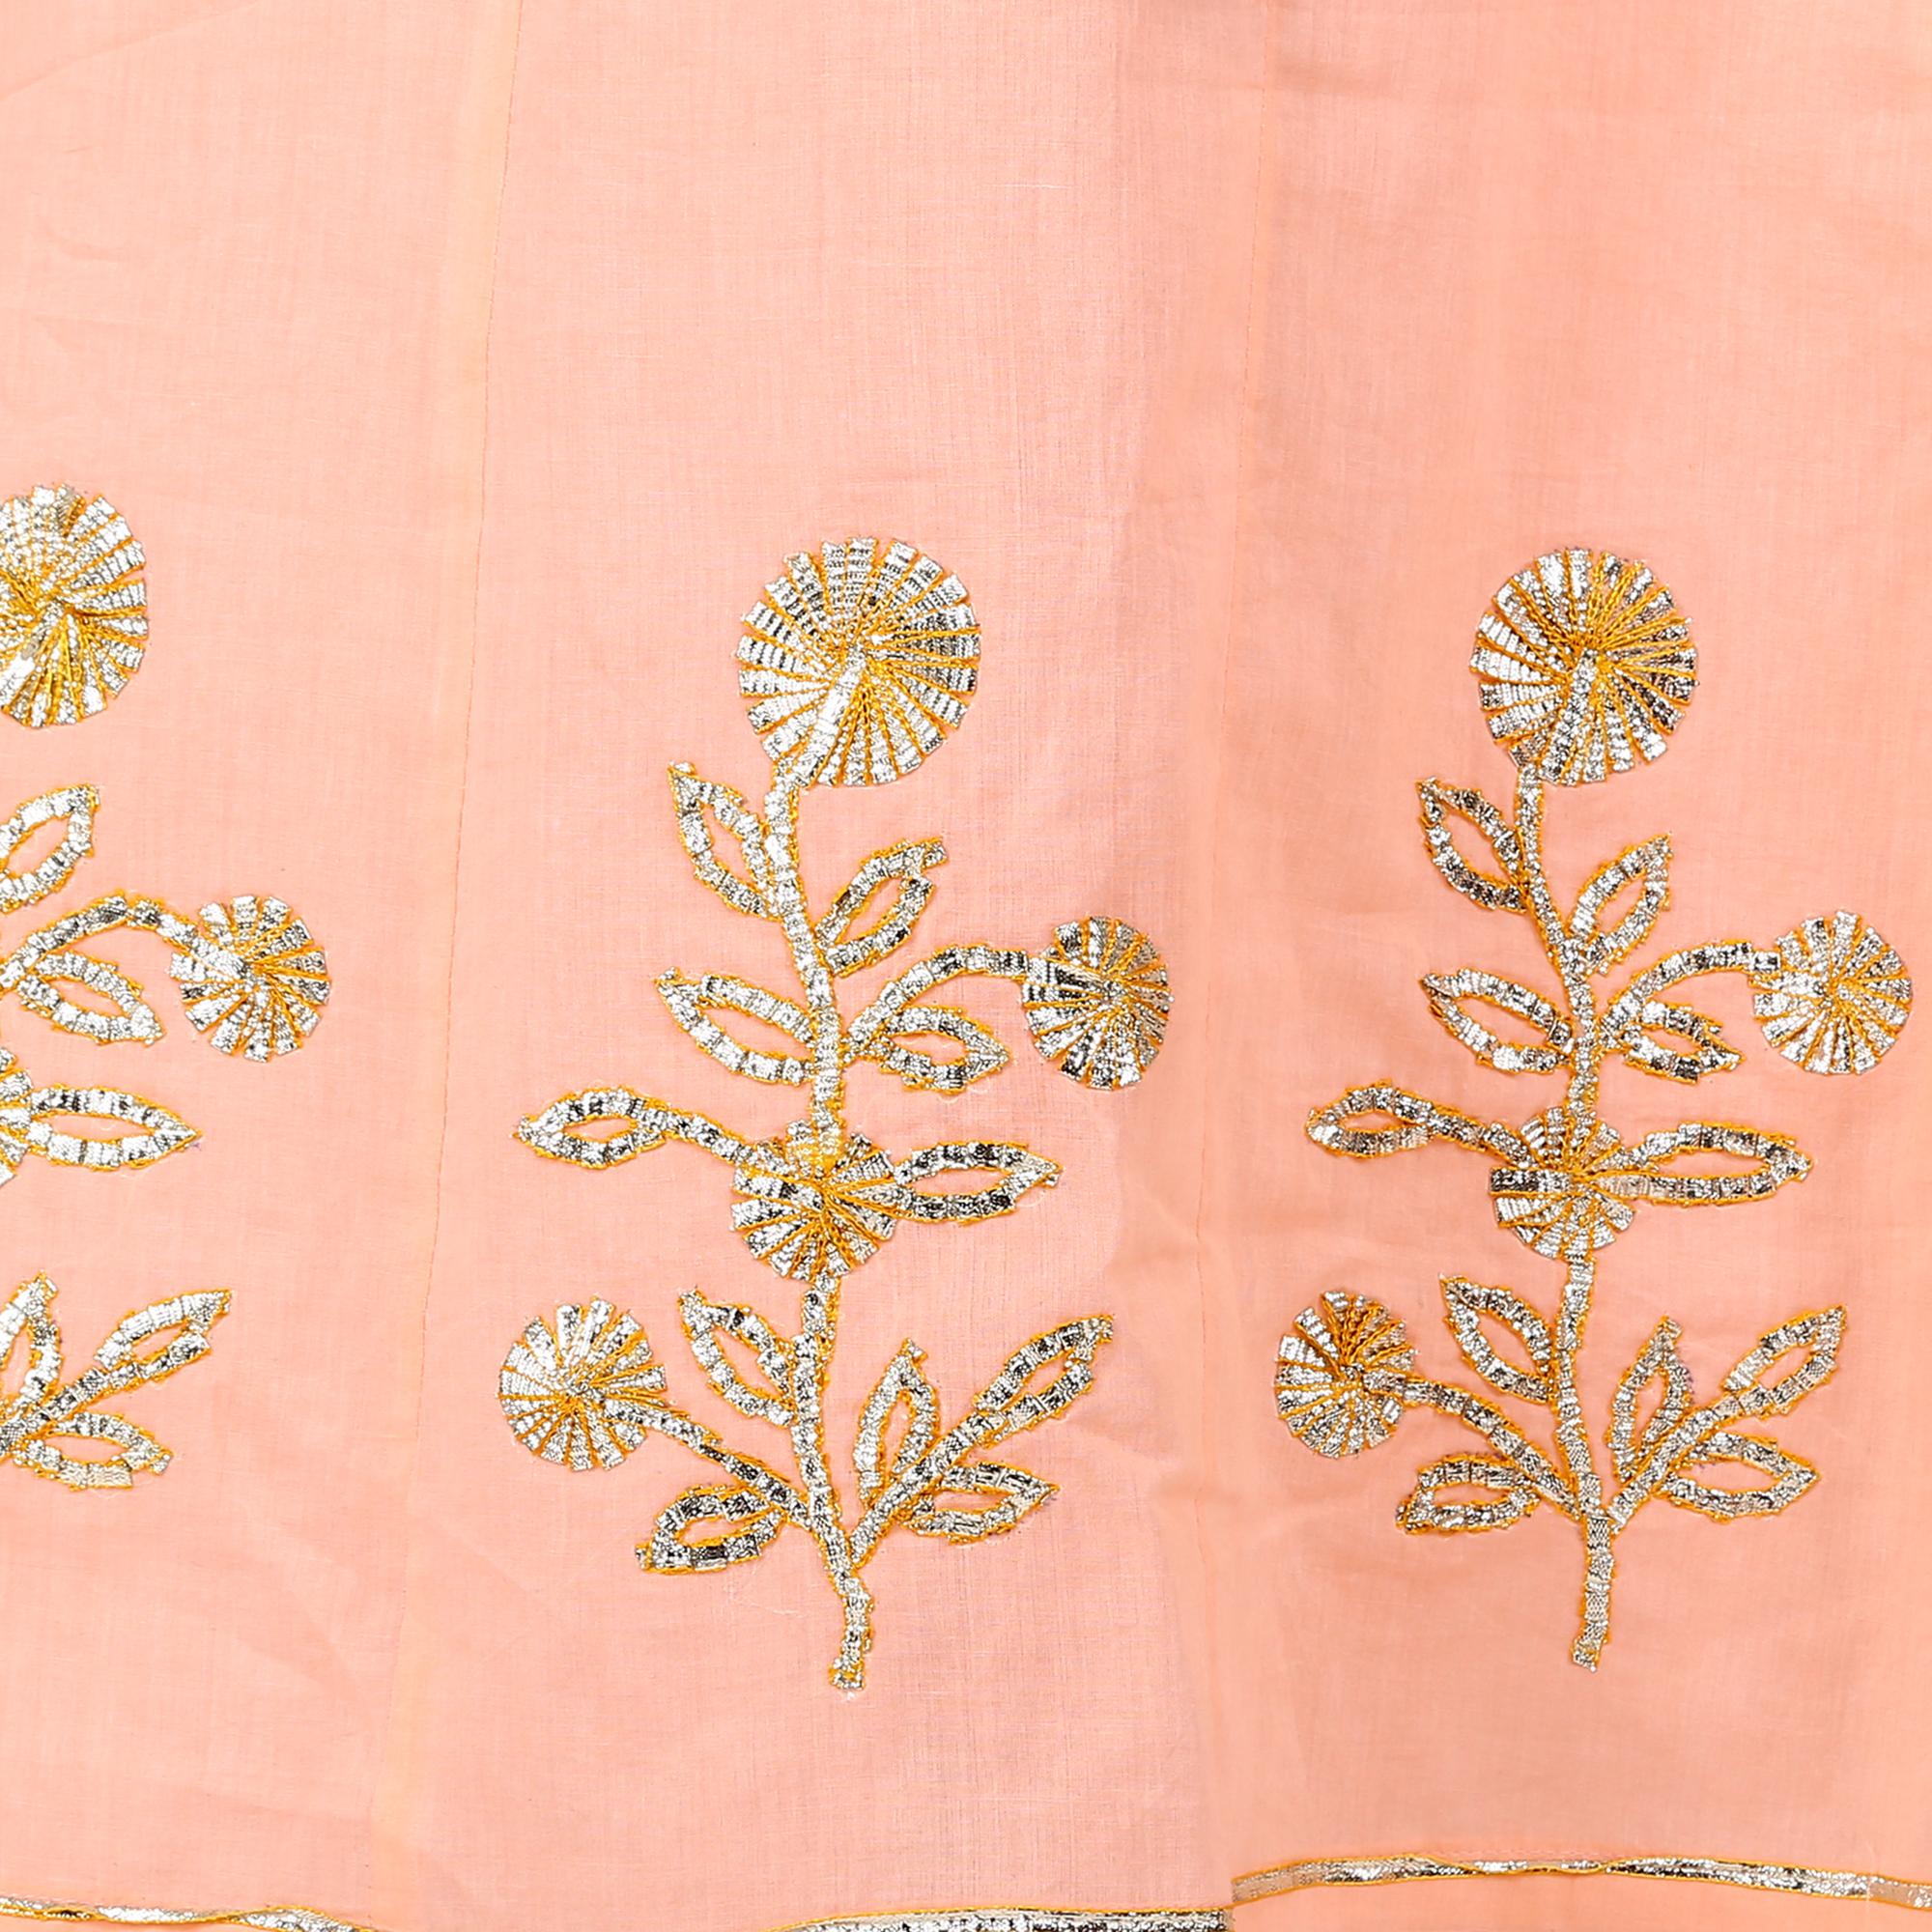 d961610bb6d Plus Size Anarkali Peach Solid Cotton Kurta with Charki Gota work in Size  4XL